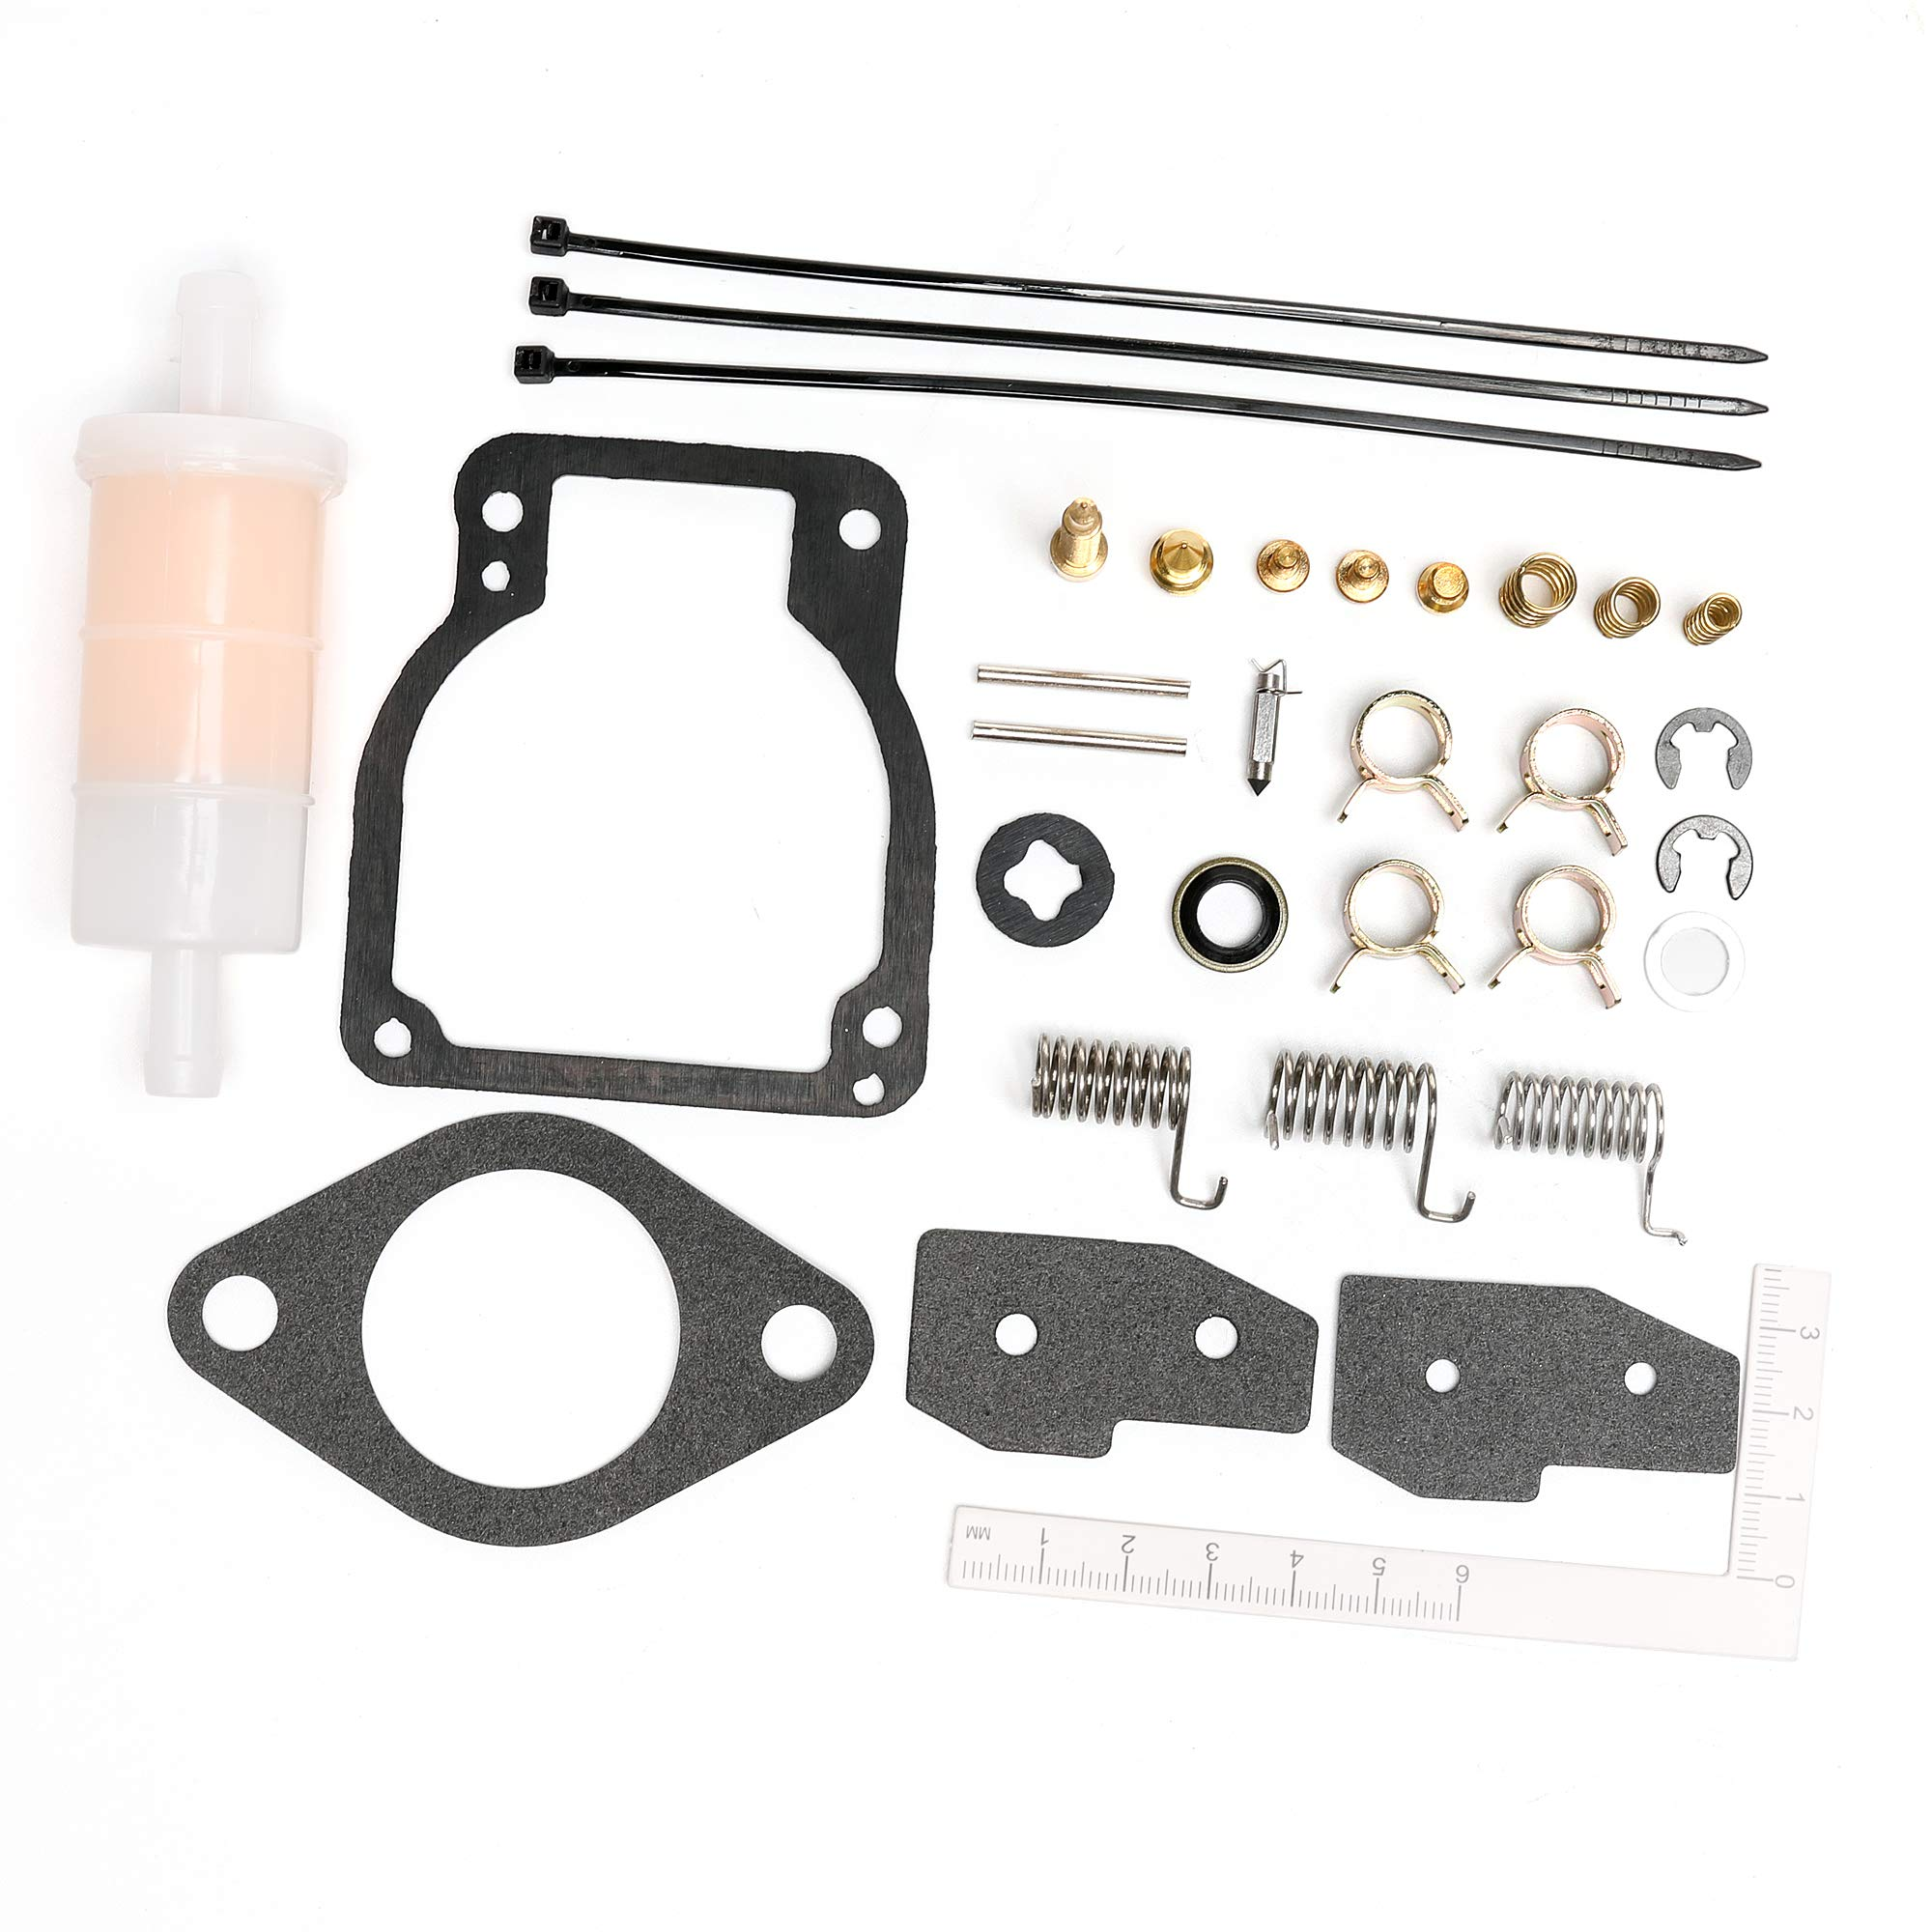 iFJF 18-7750-1 Carburetor Kit For Sierra Mercury Mariner Outboard Motor Replaces 1395-8236354 by iFJF (Image #4)